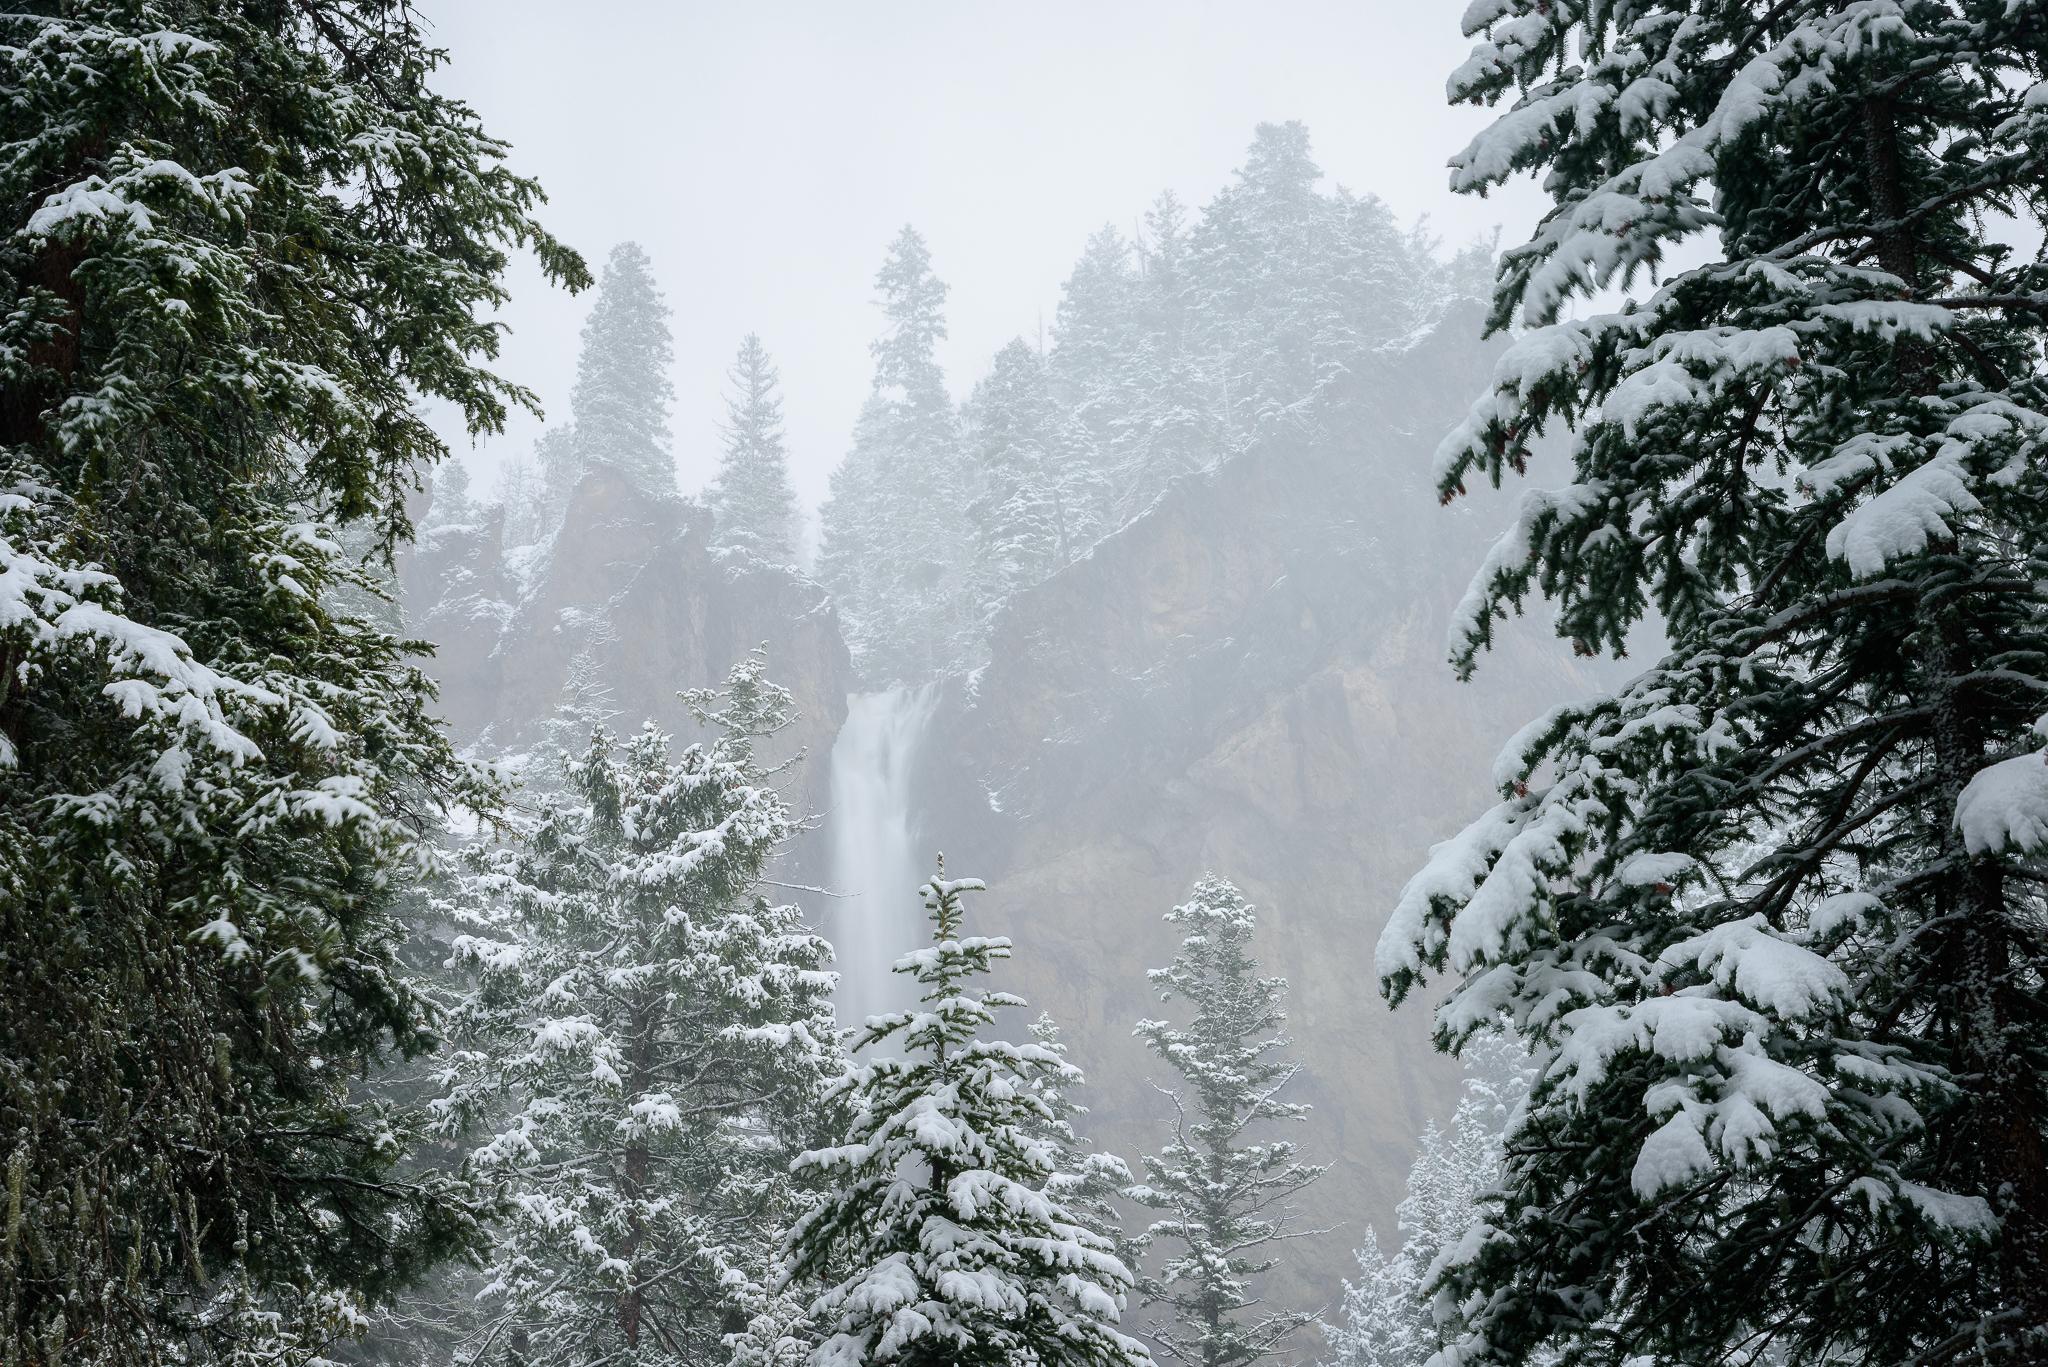 Treasure Falls peaking through the trees. Wolf Creek Pass, CO.